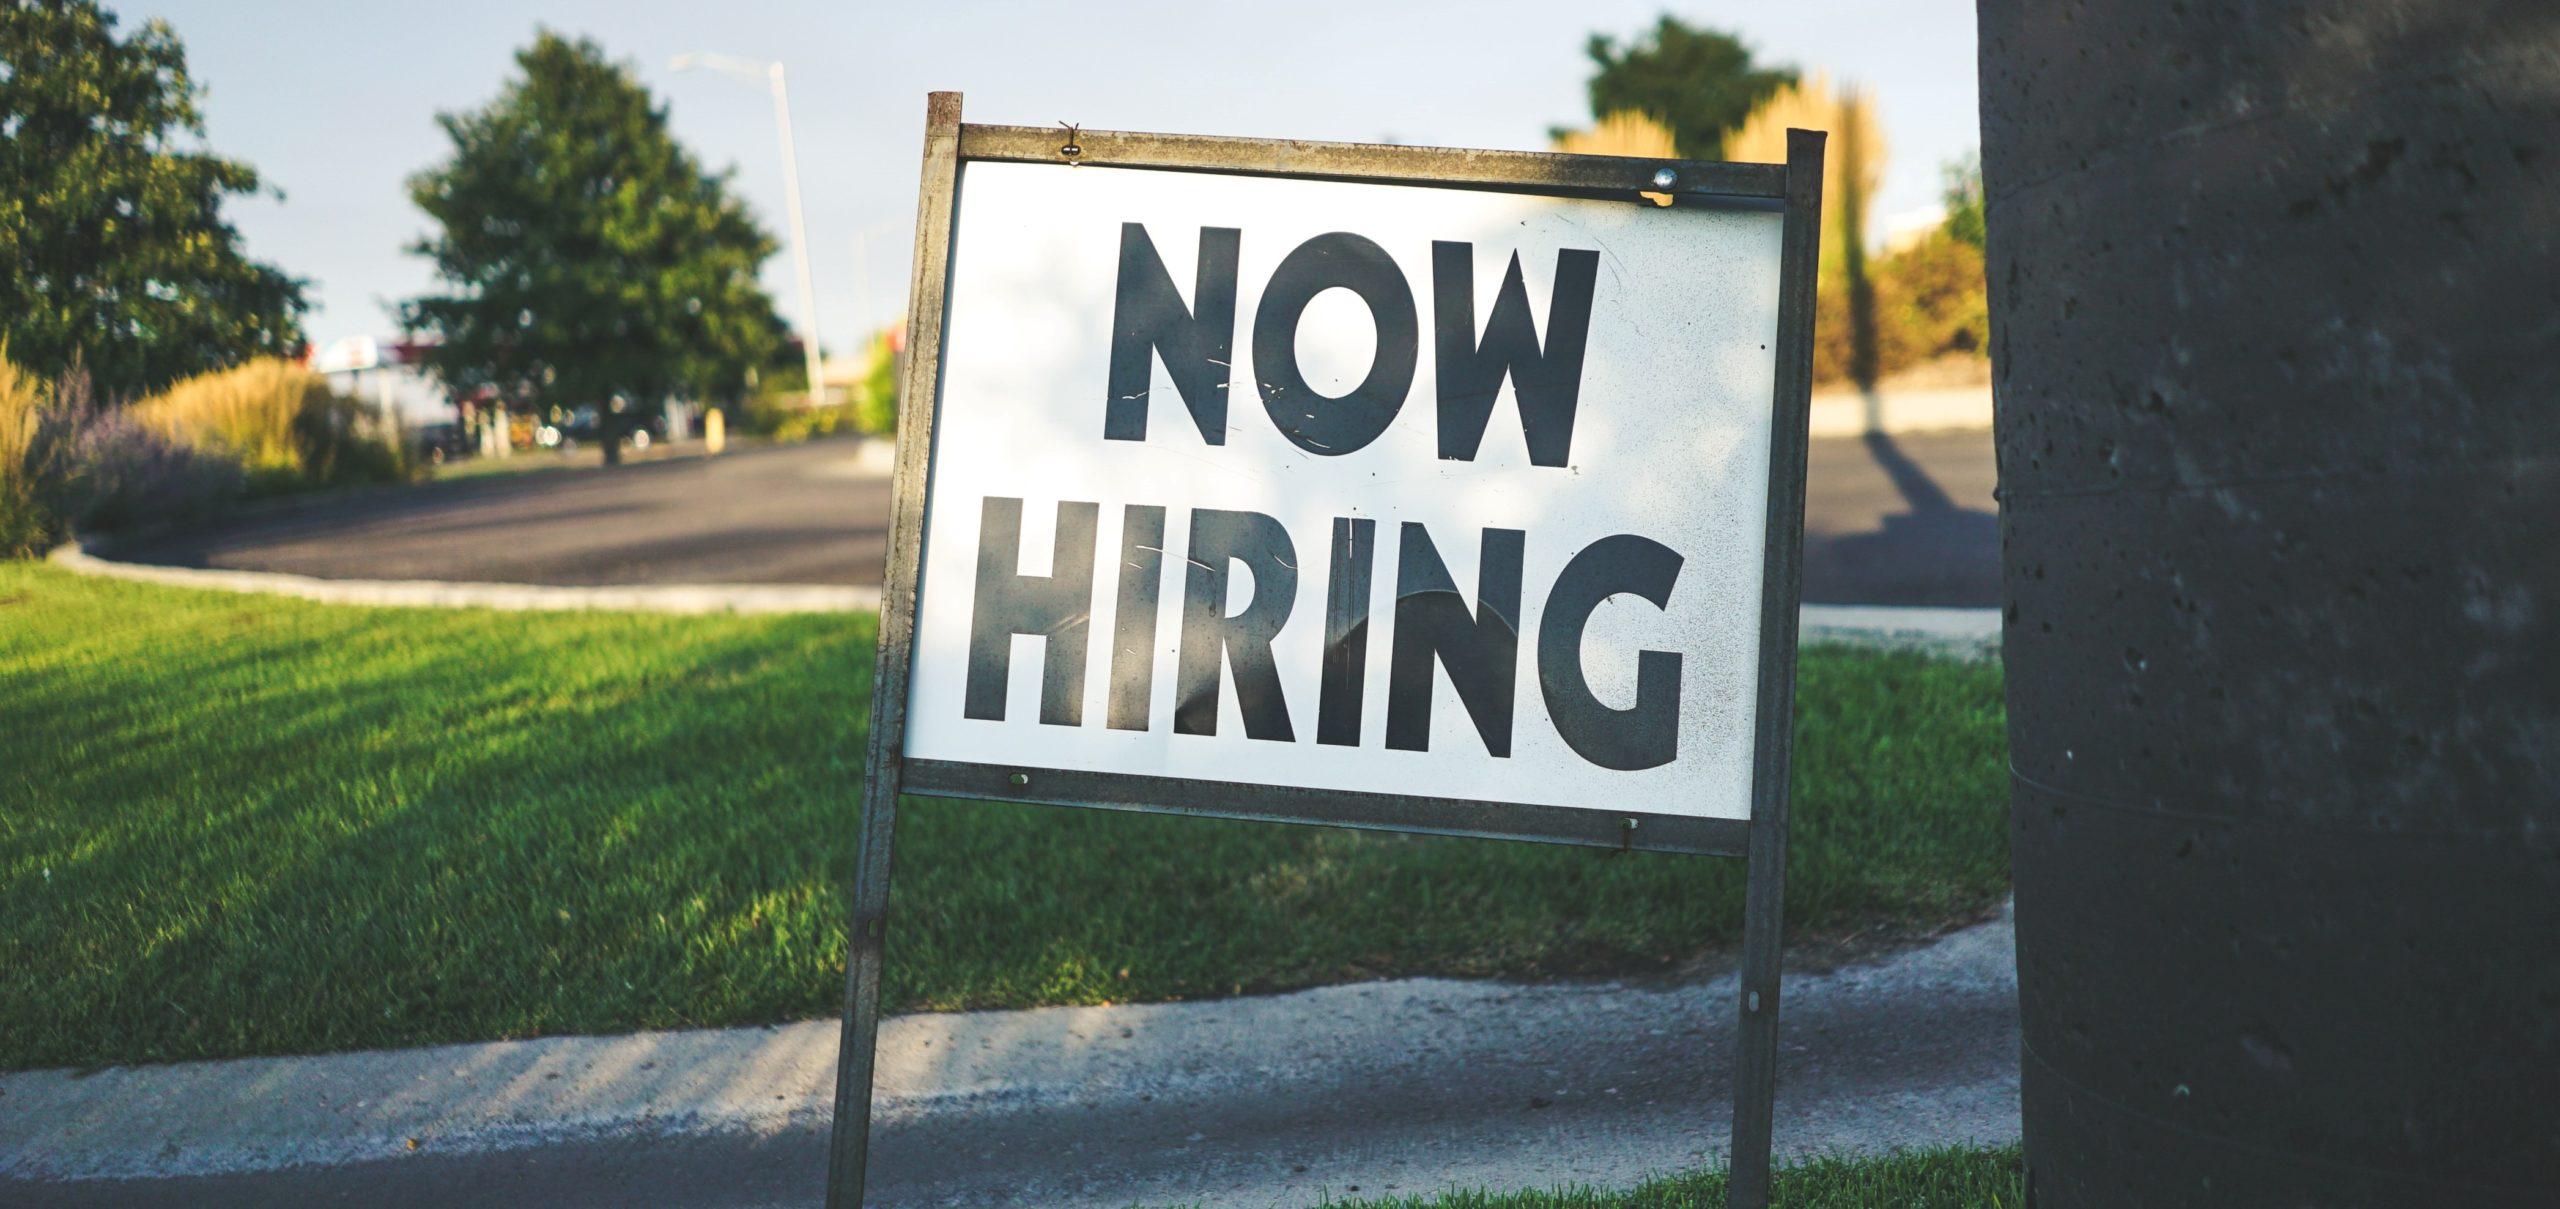 Online hiring in Feb. up 10%—Monster.com